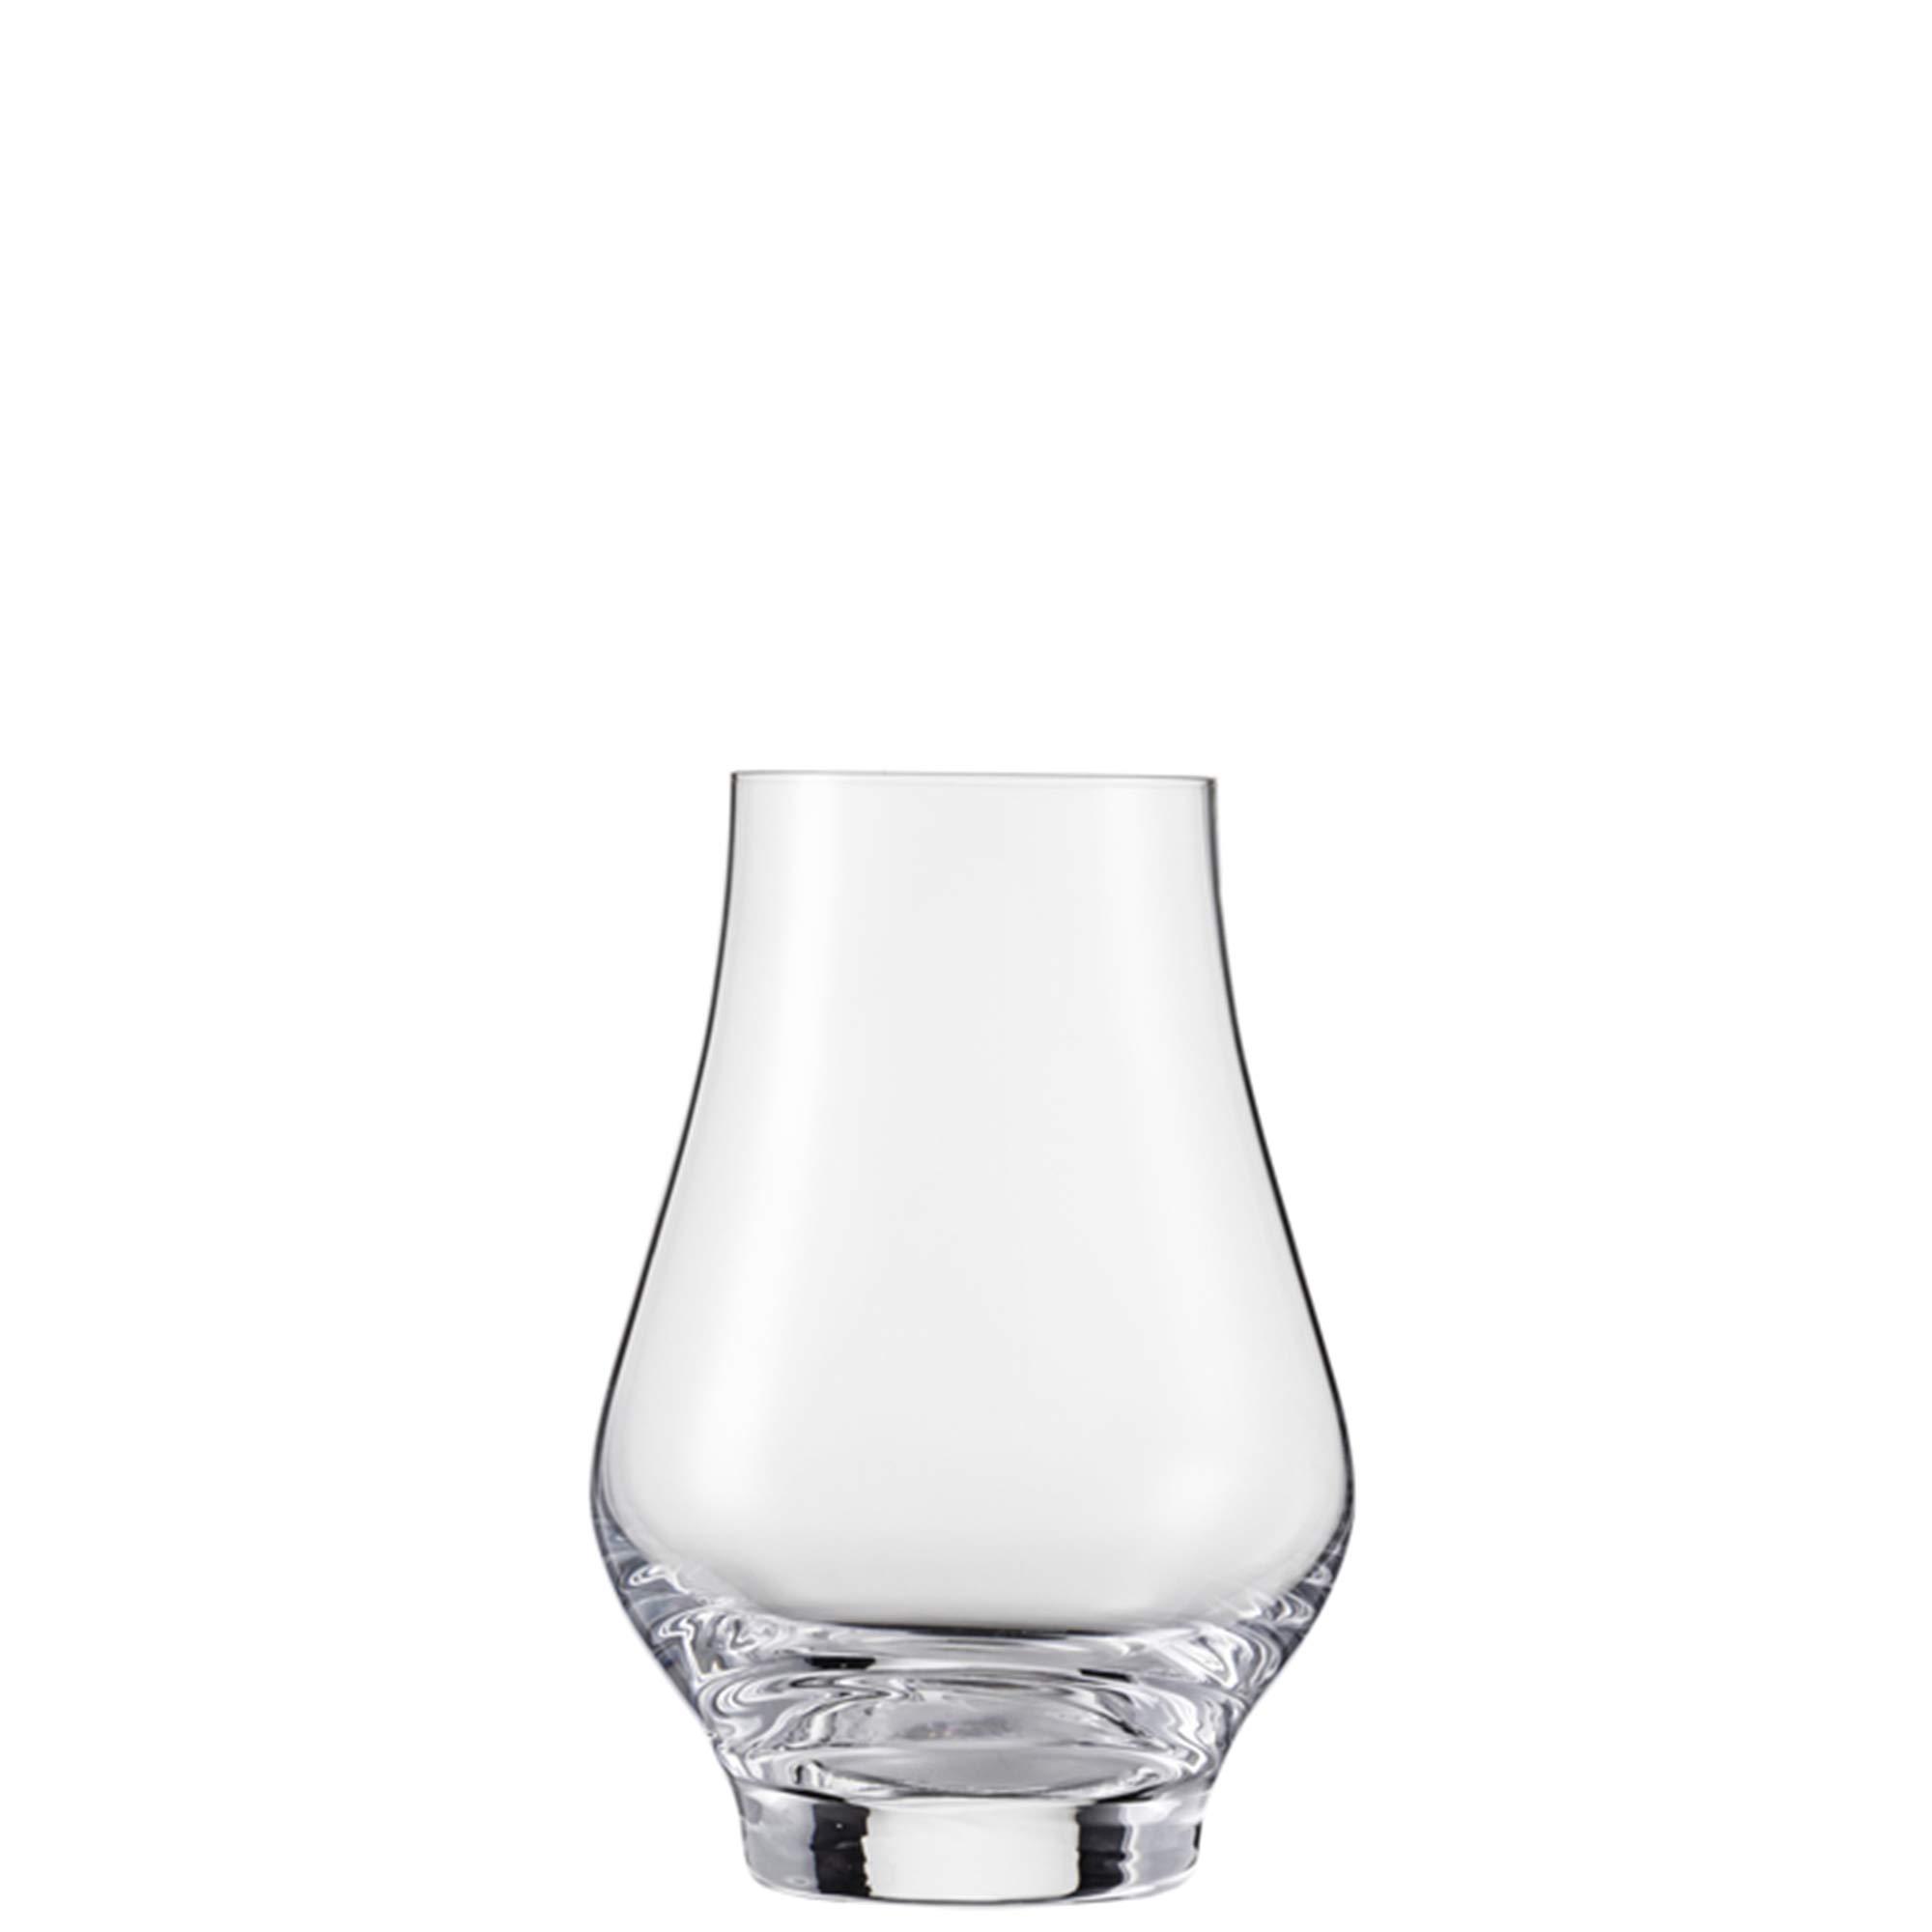 Schott Zwiesel Tritan Crystal Glass Barware Bar Special Whiskey Cocktail Nosing Snifter Glasses (Set of 6), 10.9 oz, Clear by Schott Zwiesel